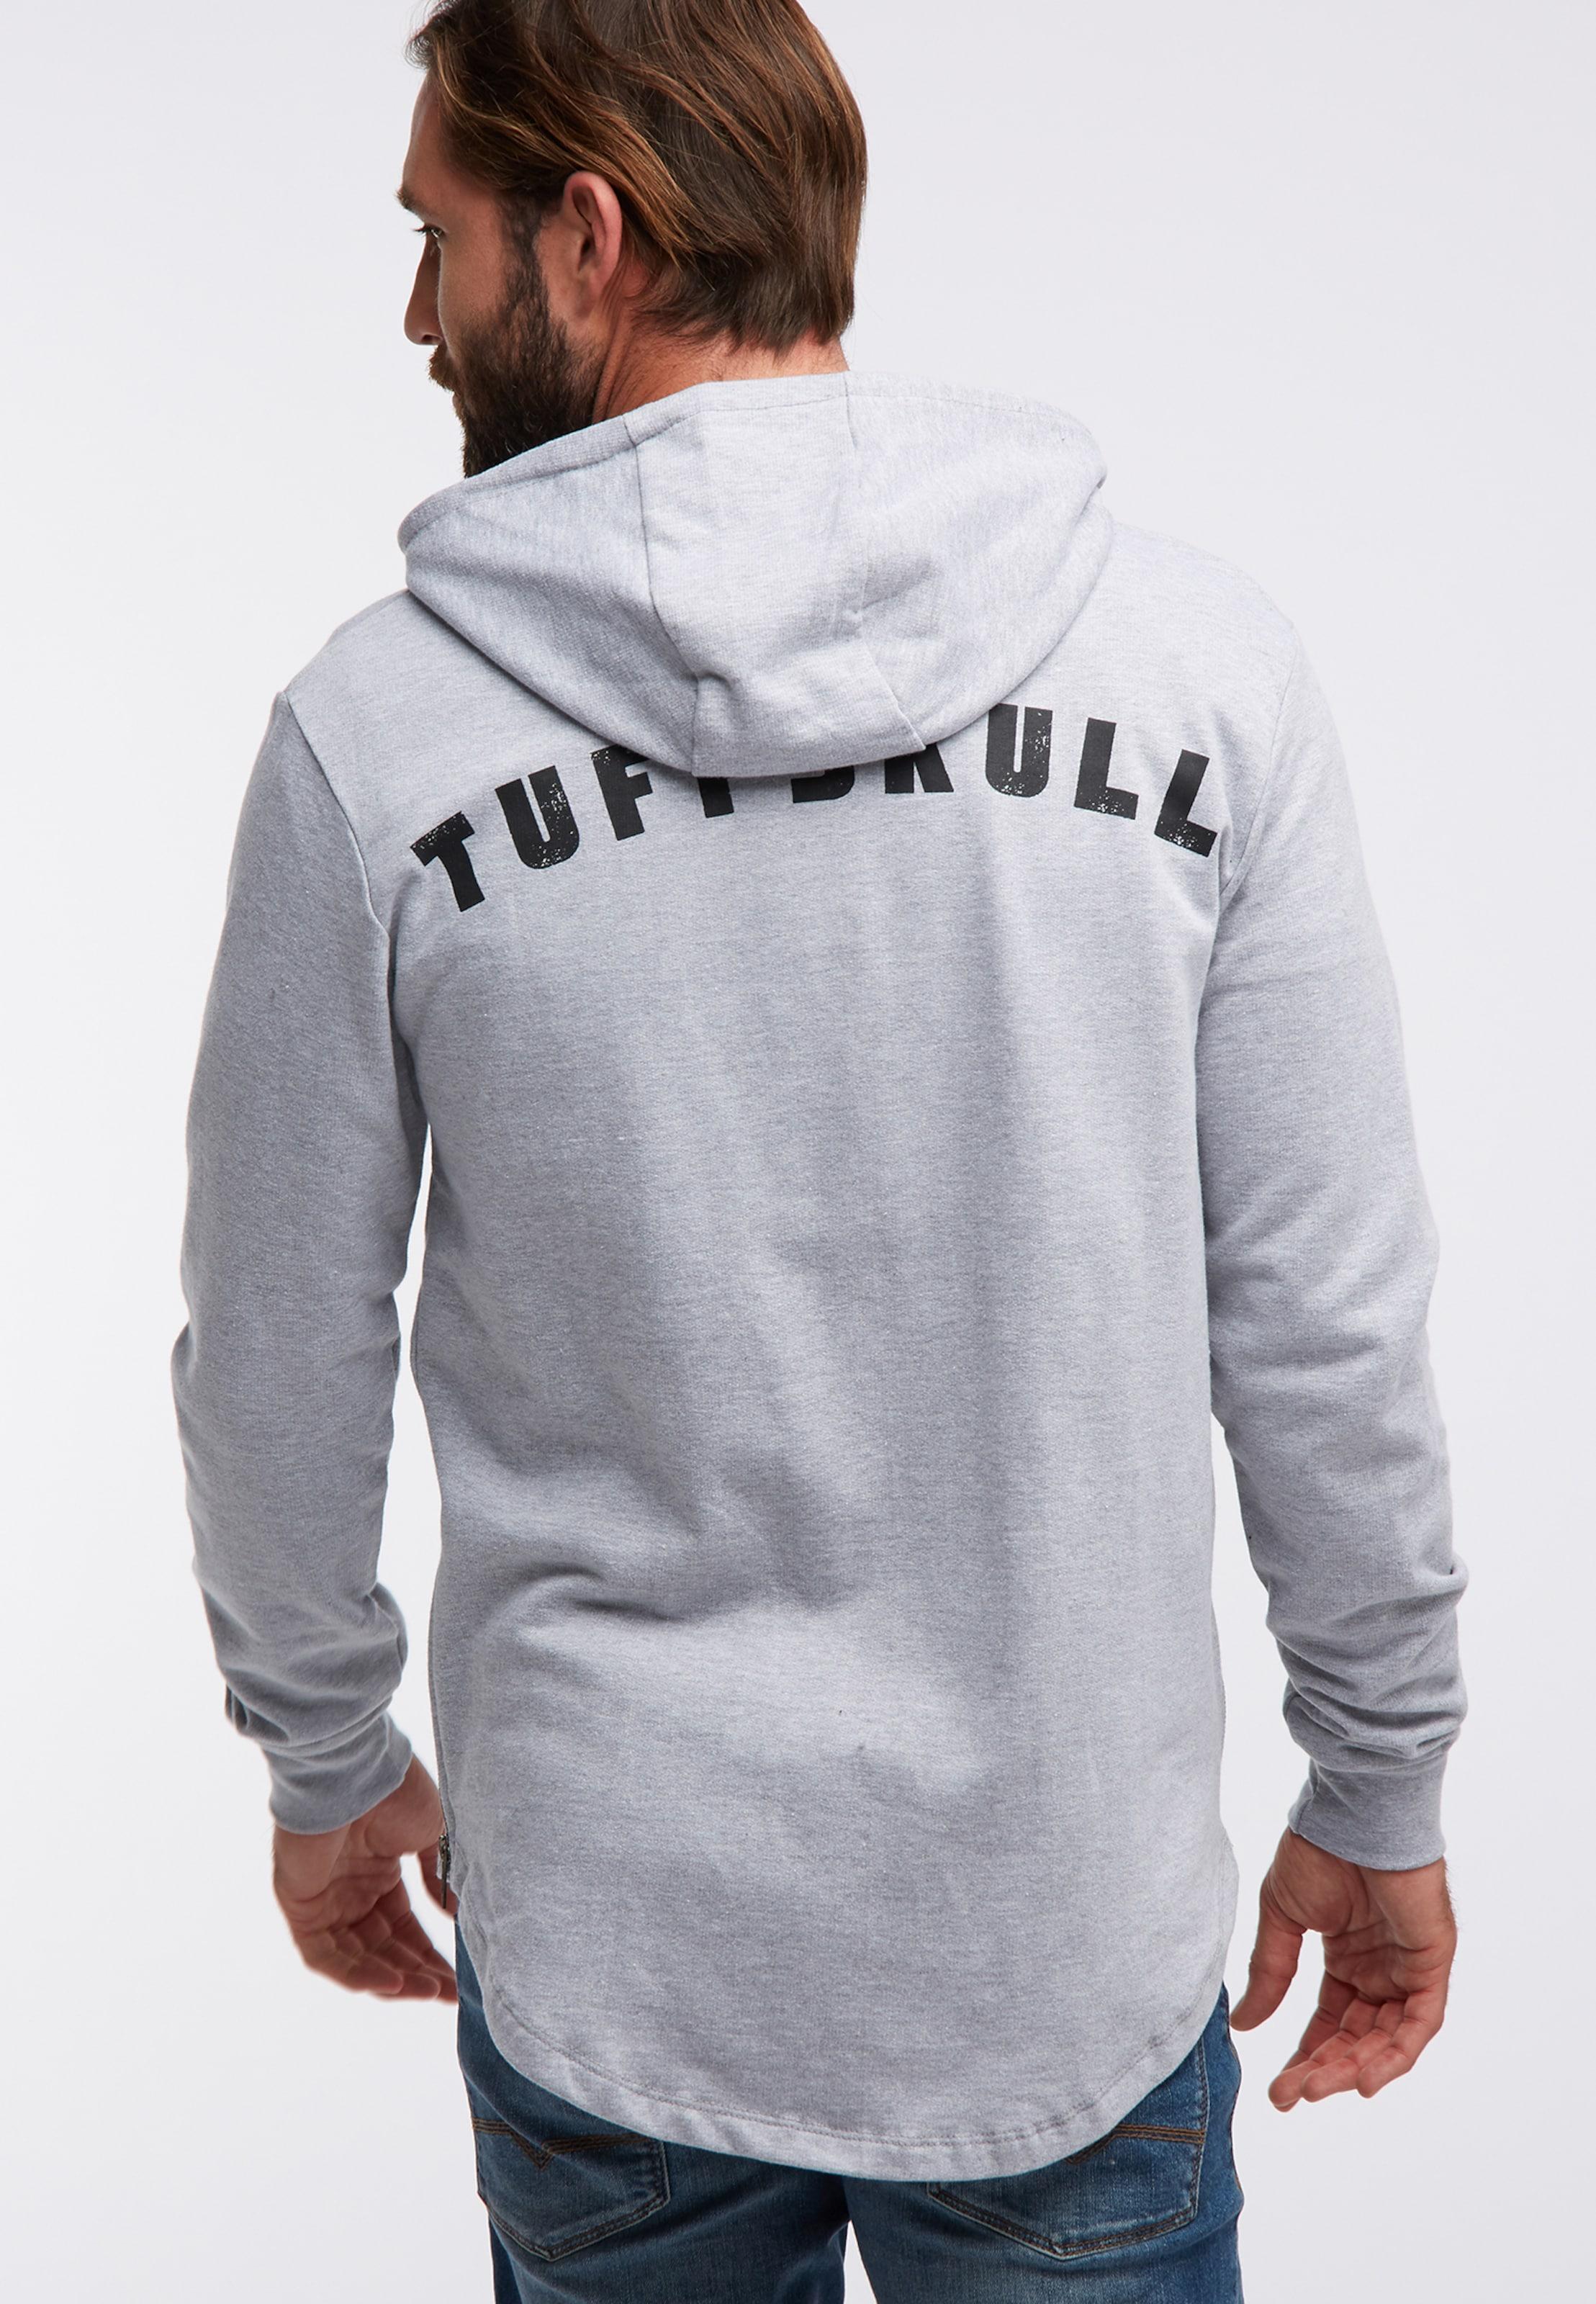 Sweatjacke Tuffskull Sweatjacke Tuffskull Sweatjacke Tuffskull In Grau In Grau dBCxoe